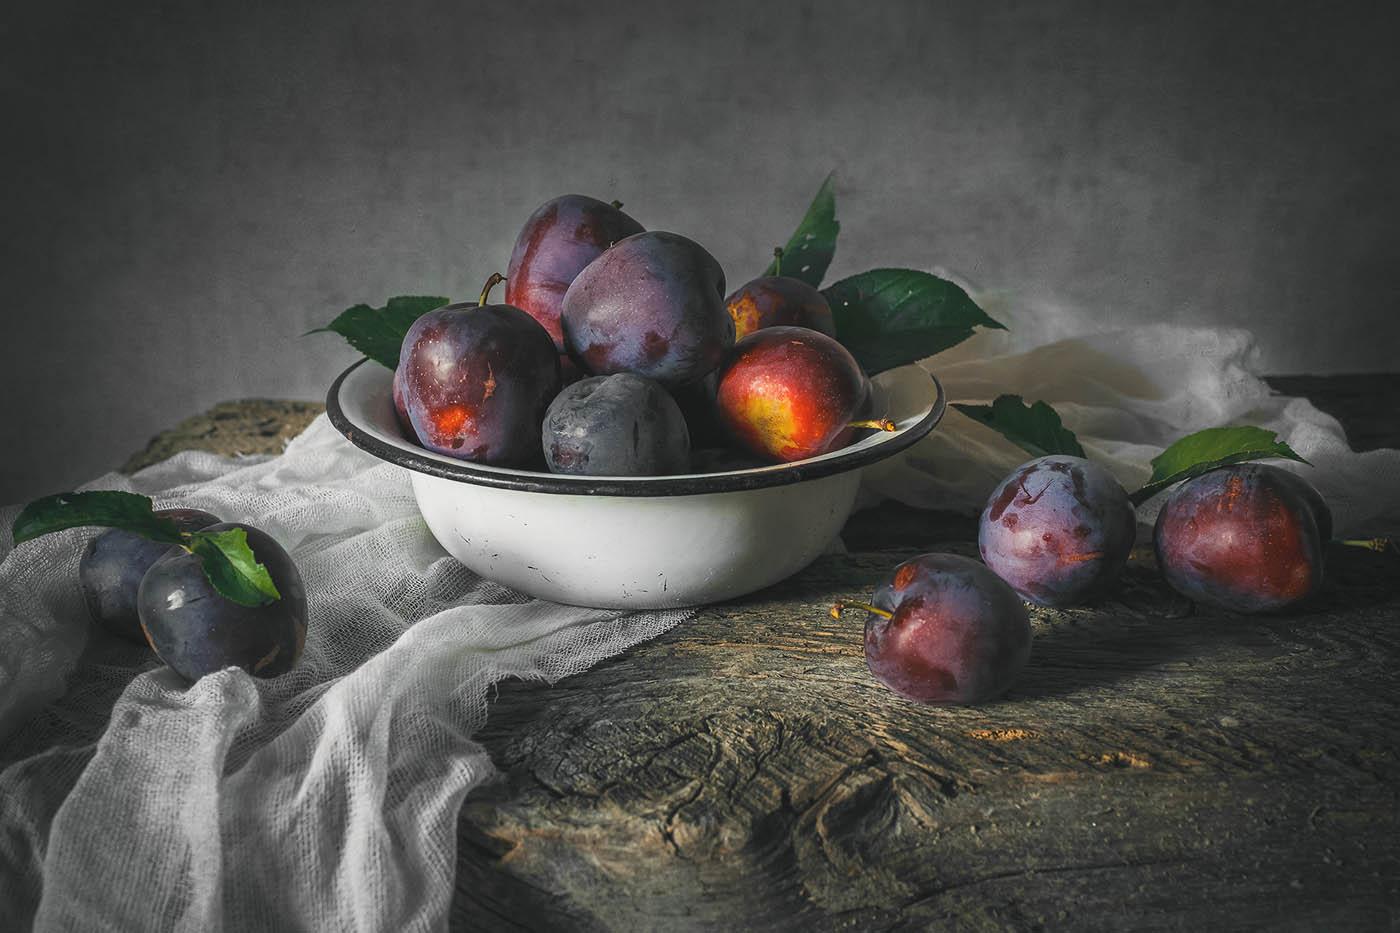 still life photography apple fruits by inna sukhova